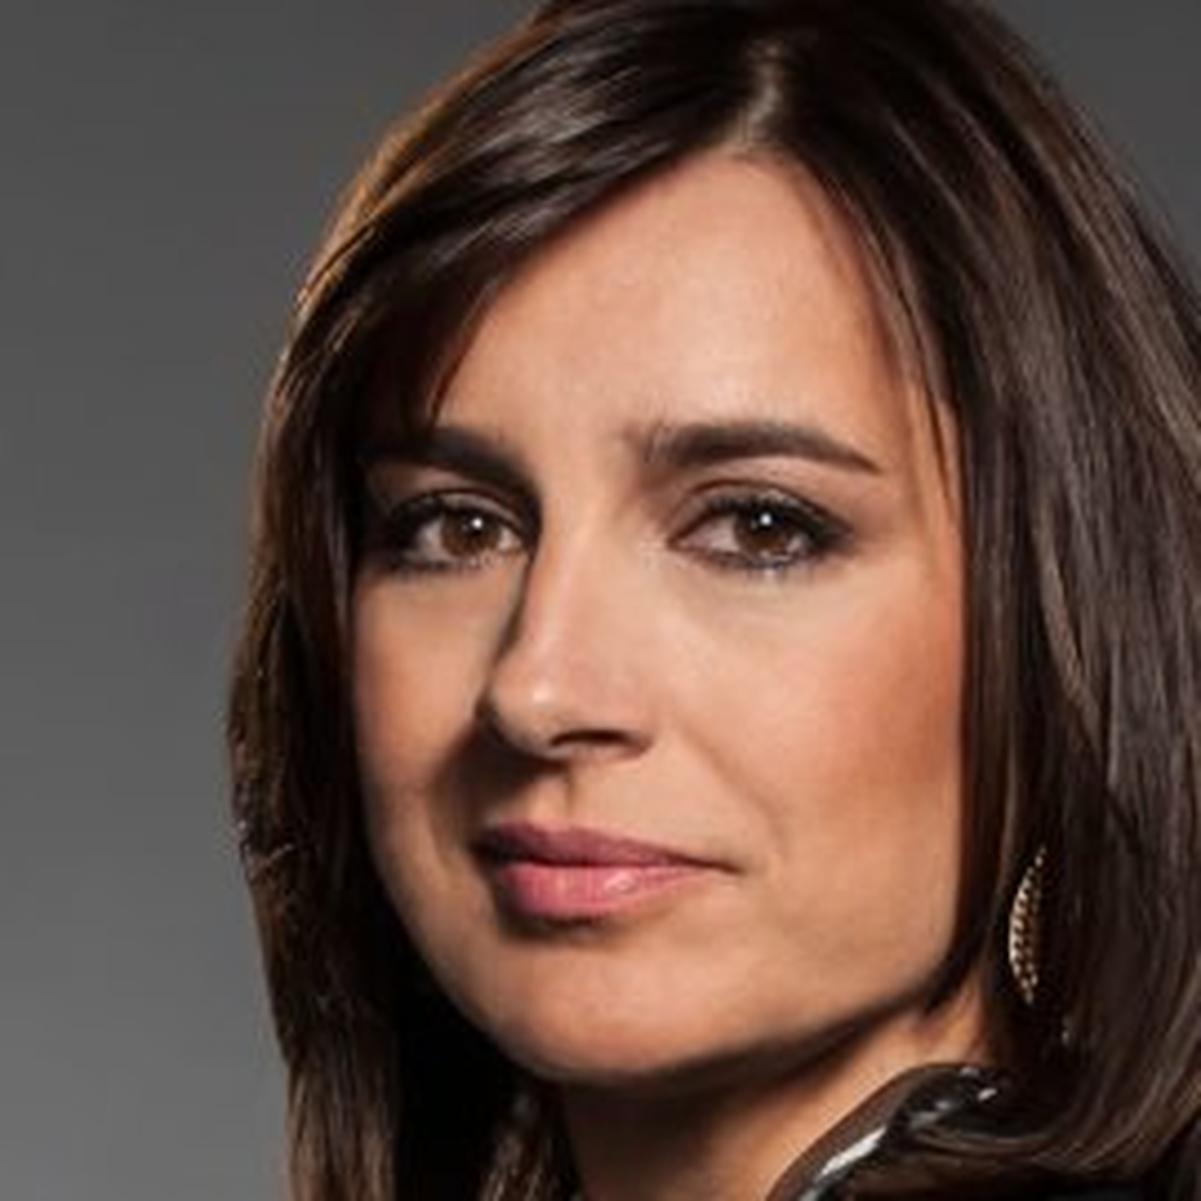 Sarah Robb O'Hagan